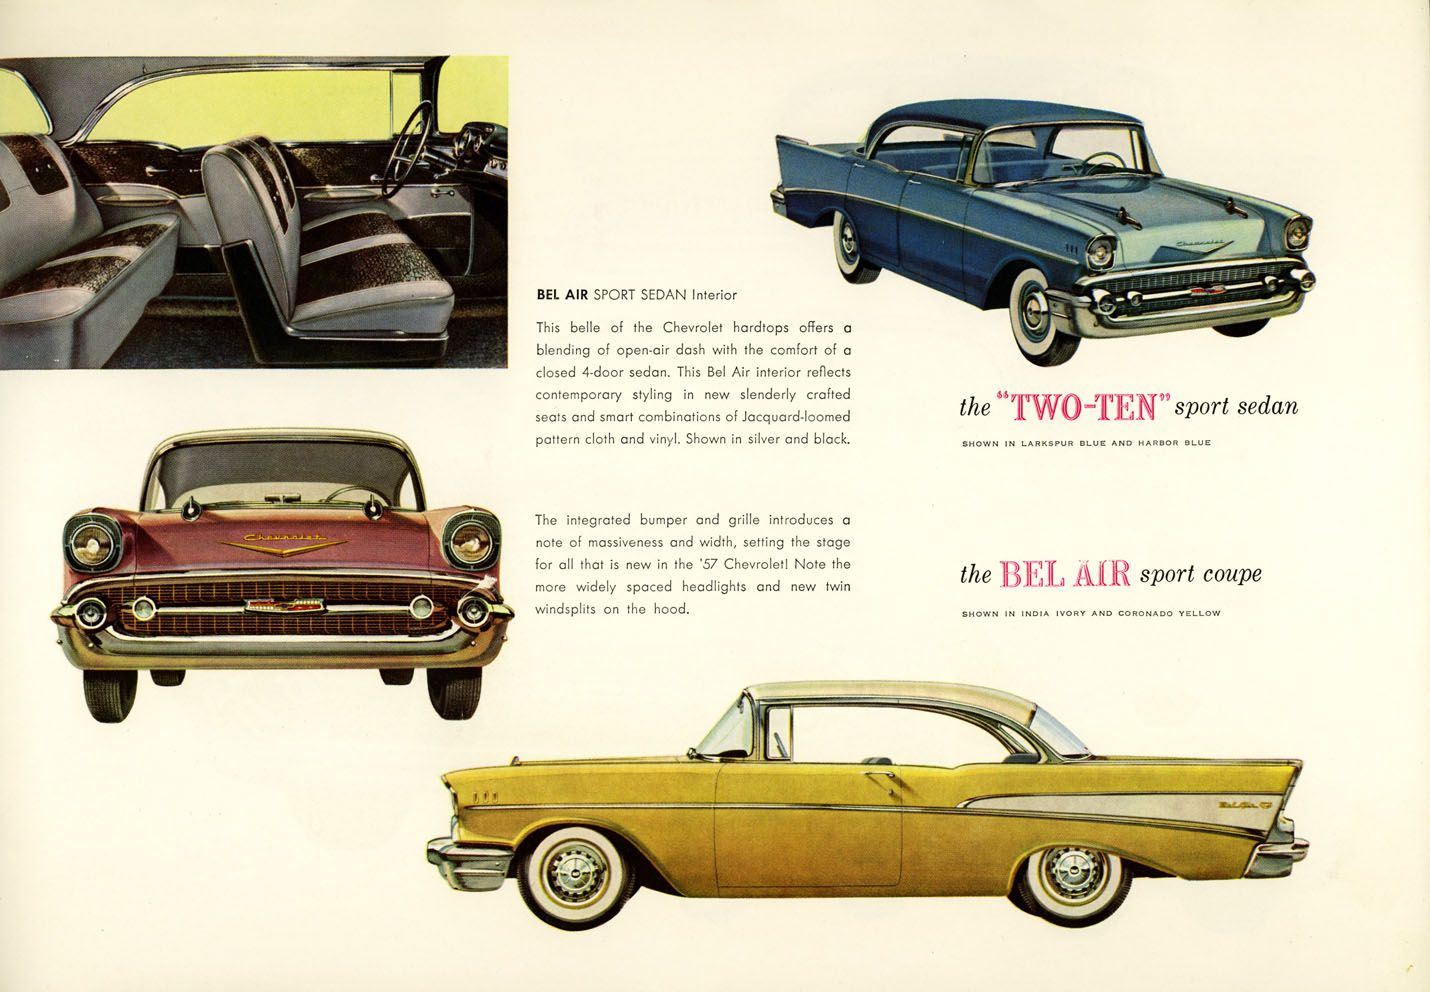 1957 Chevy 1957 Chevrolet Chevrolet Automobile Advertising